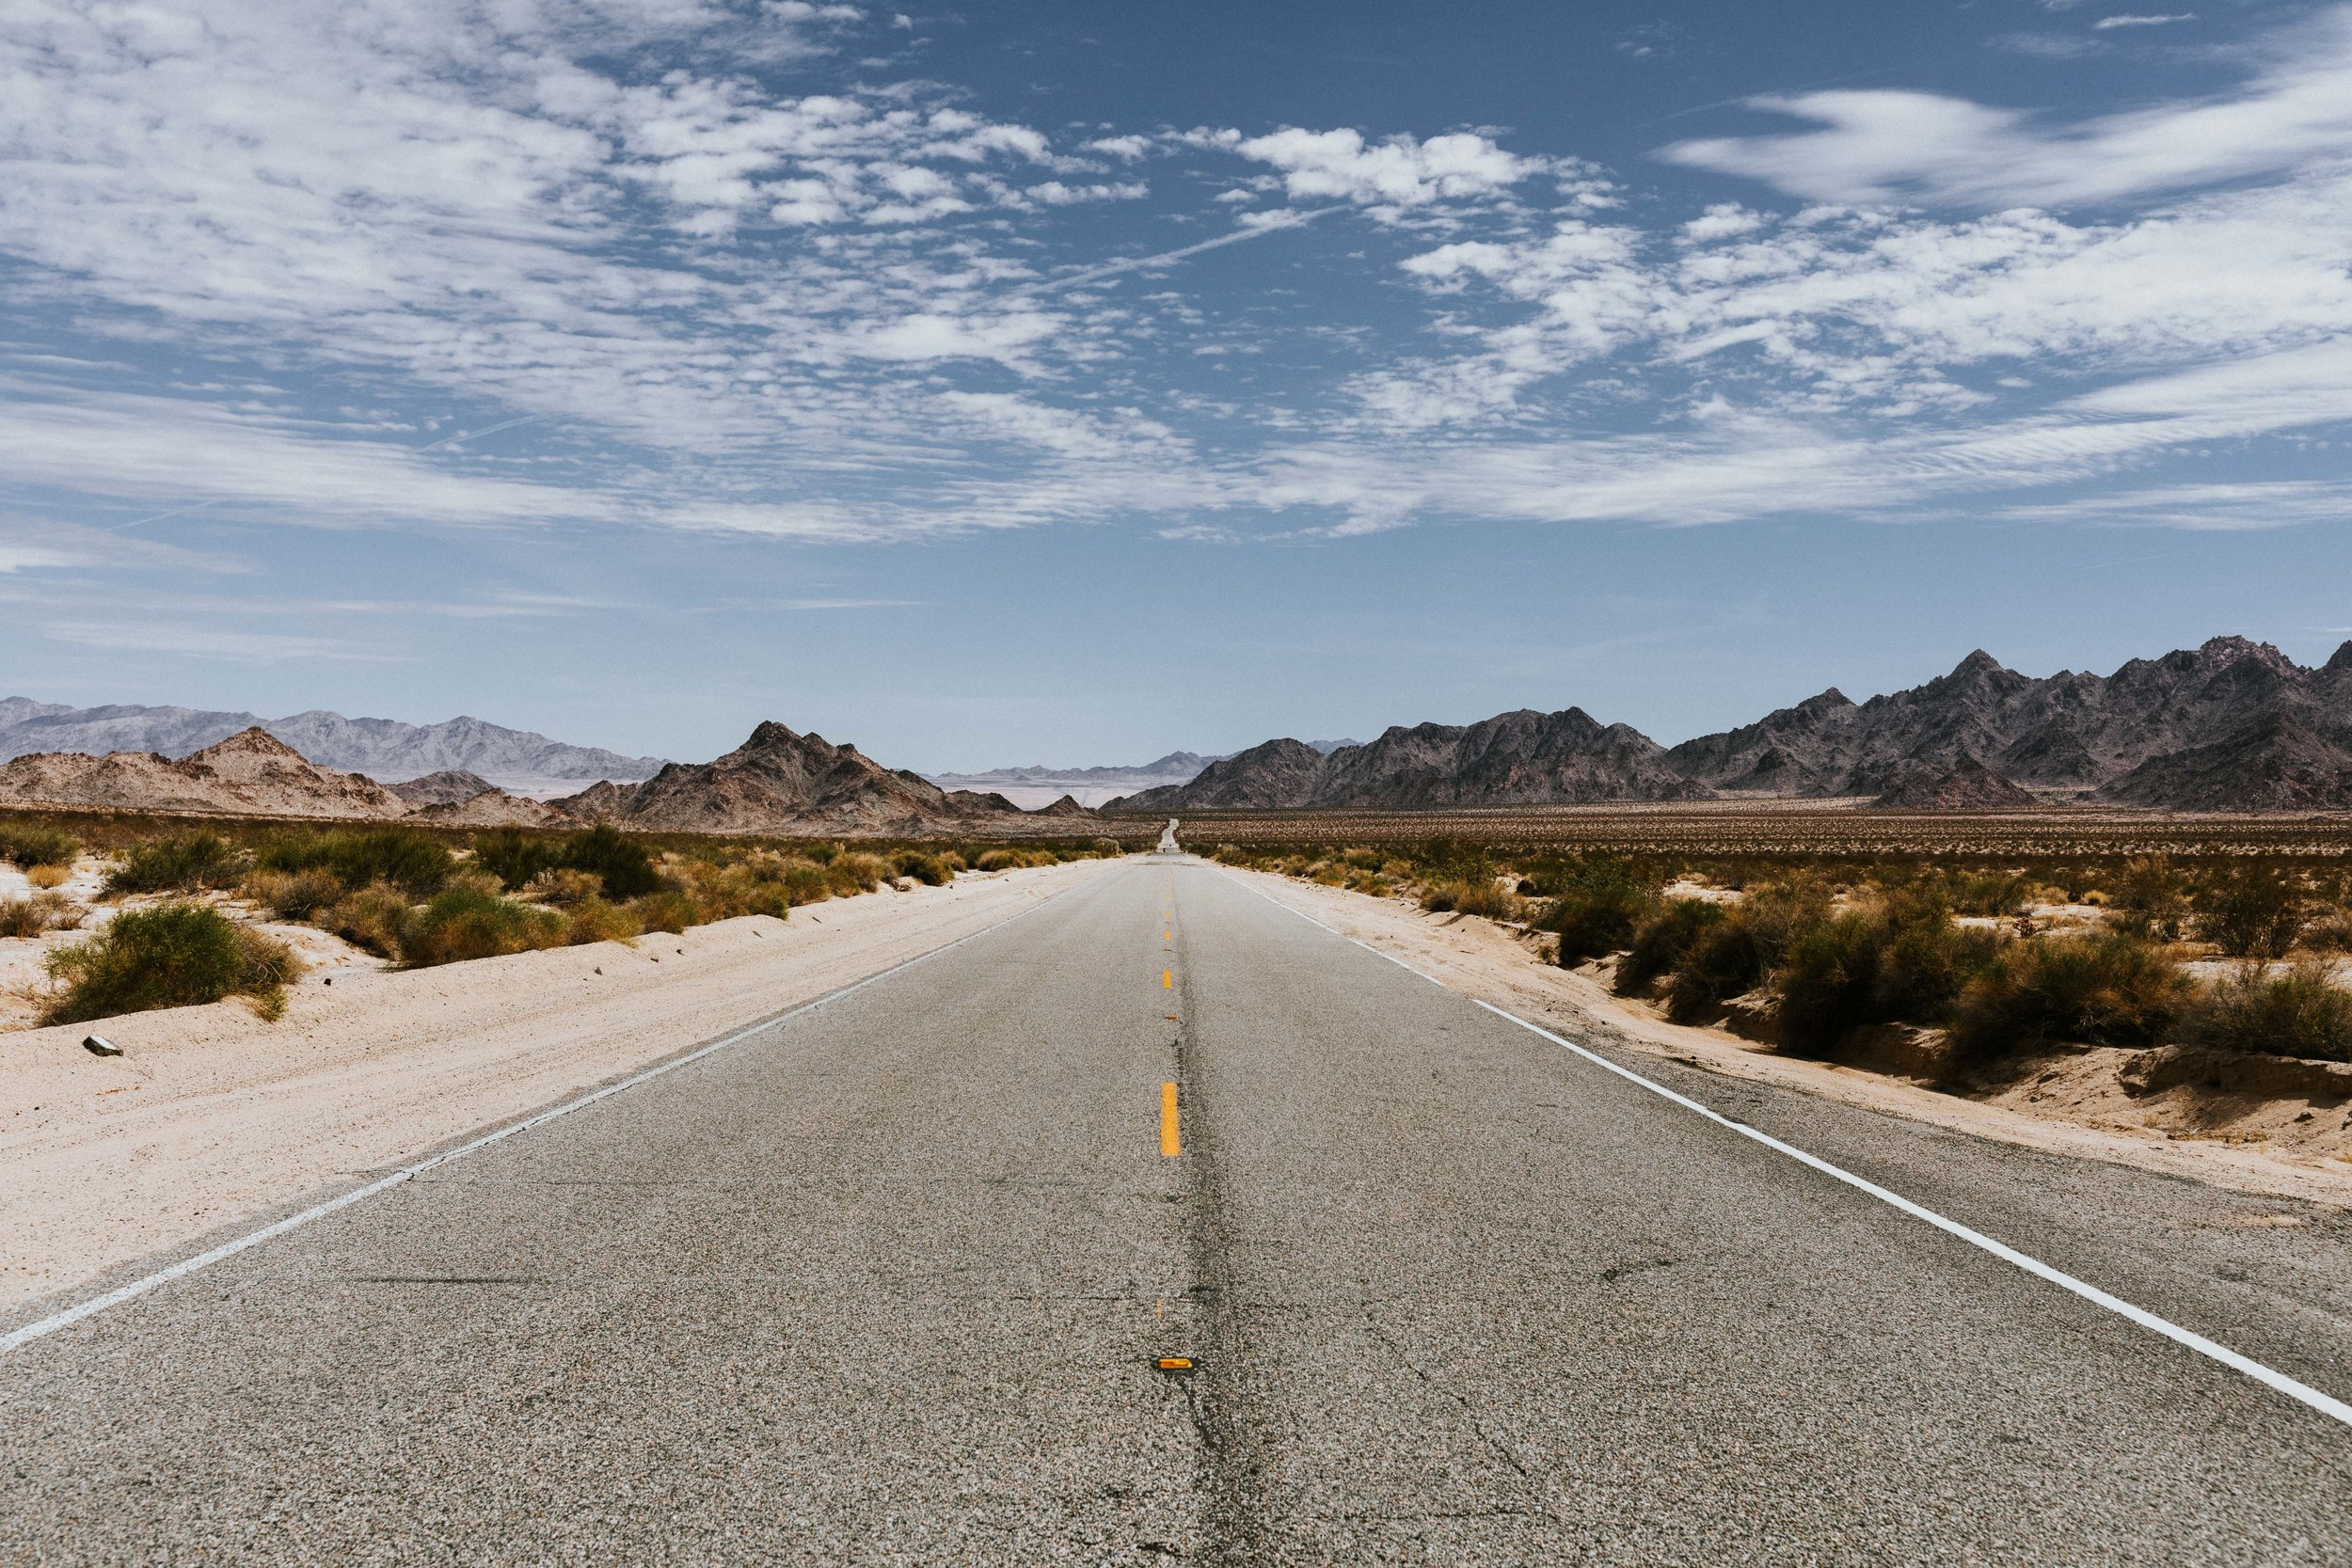 Southwest_RoadTrip-MJPHOTO-145.jpg